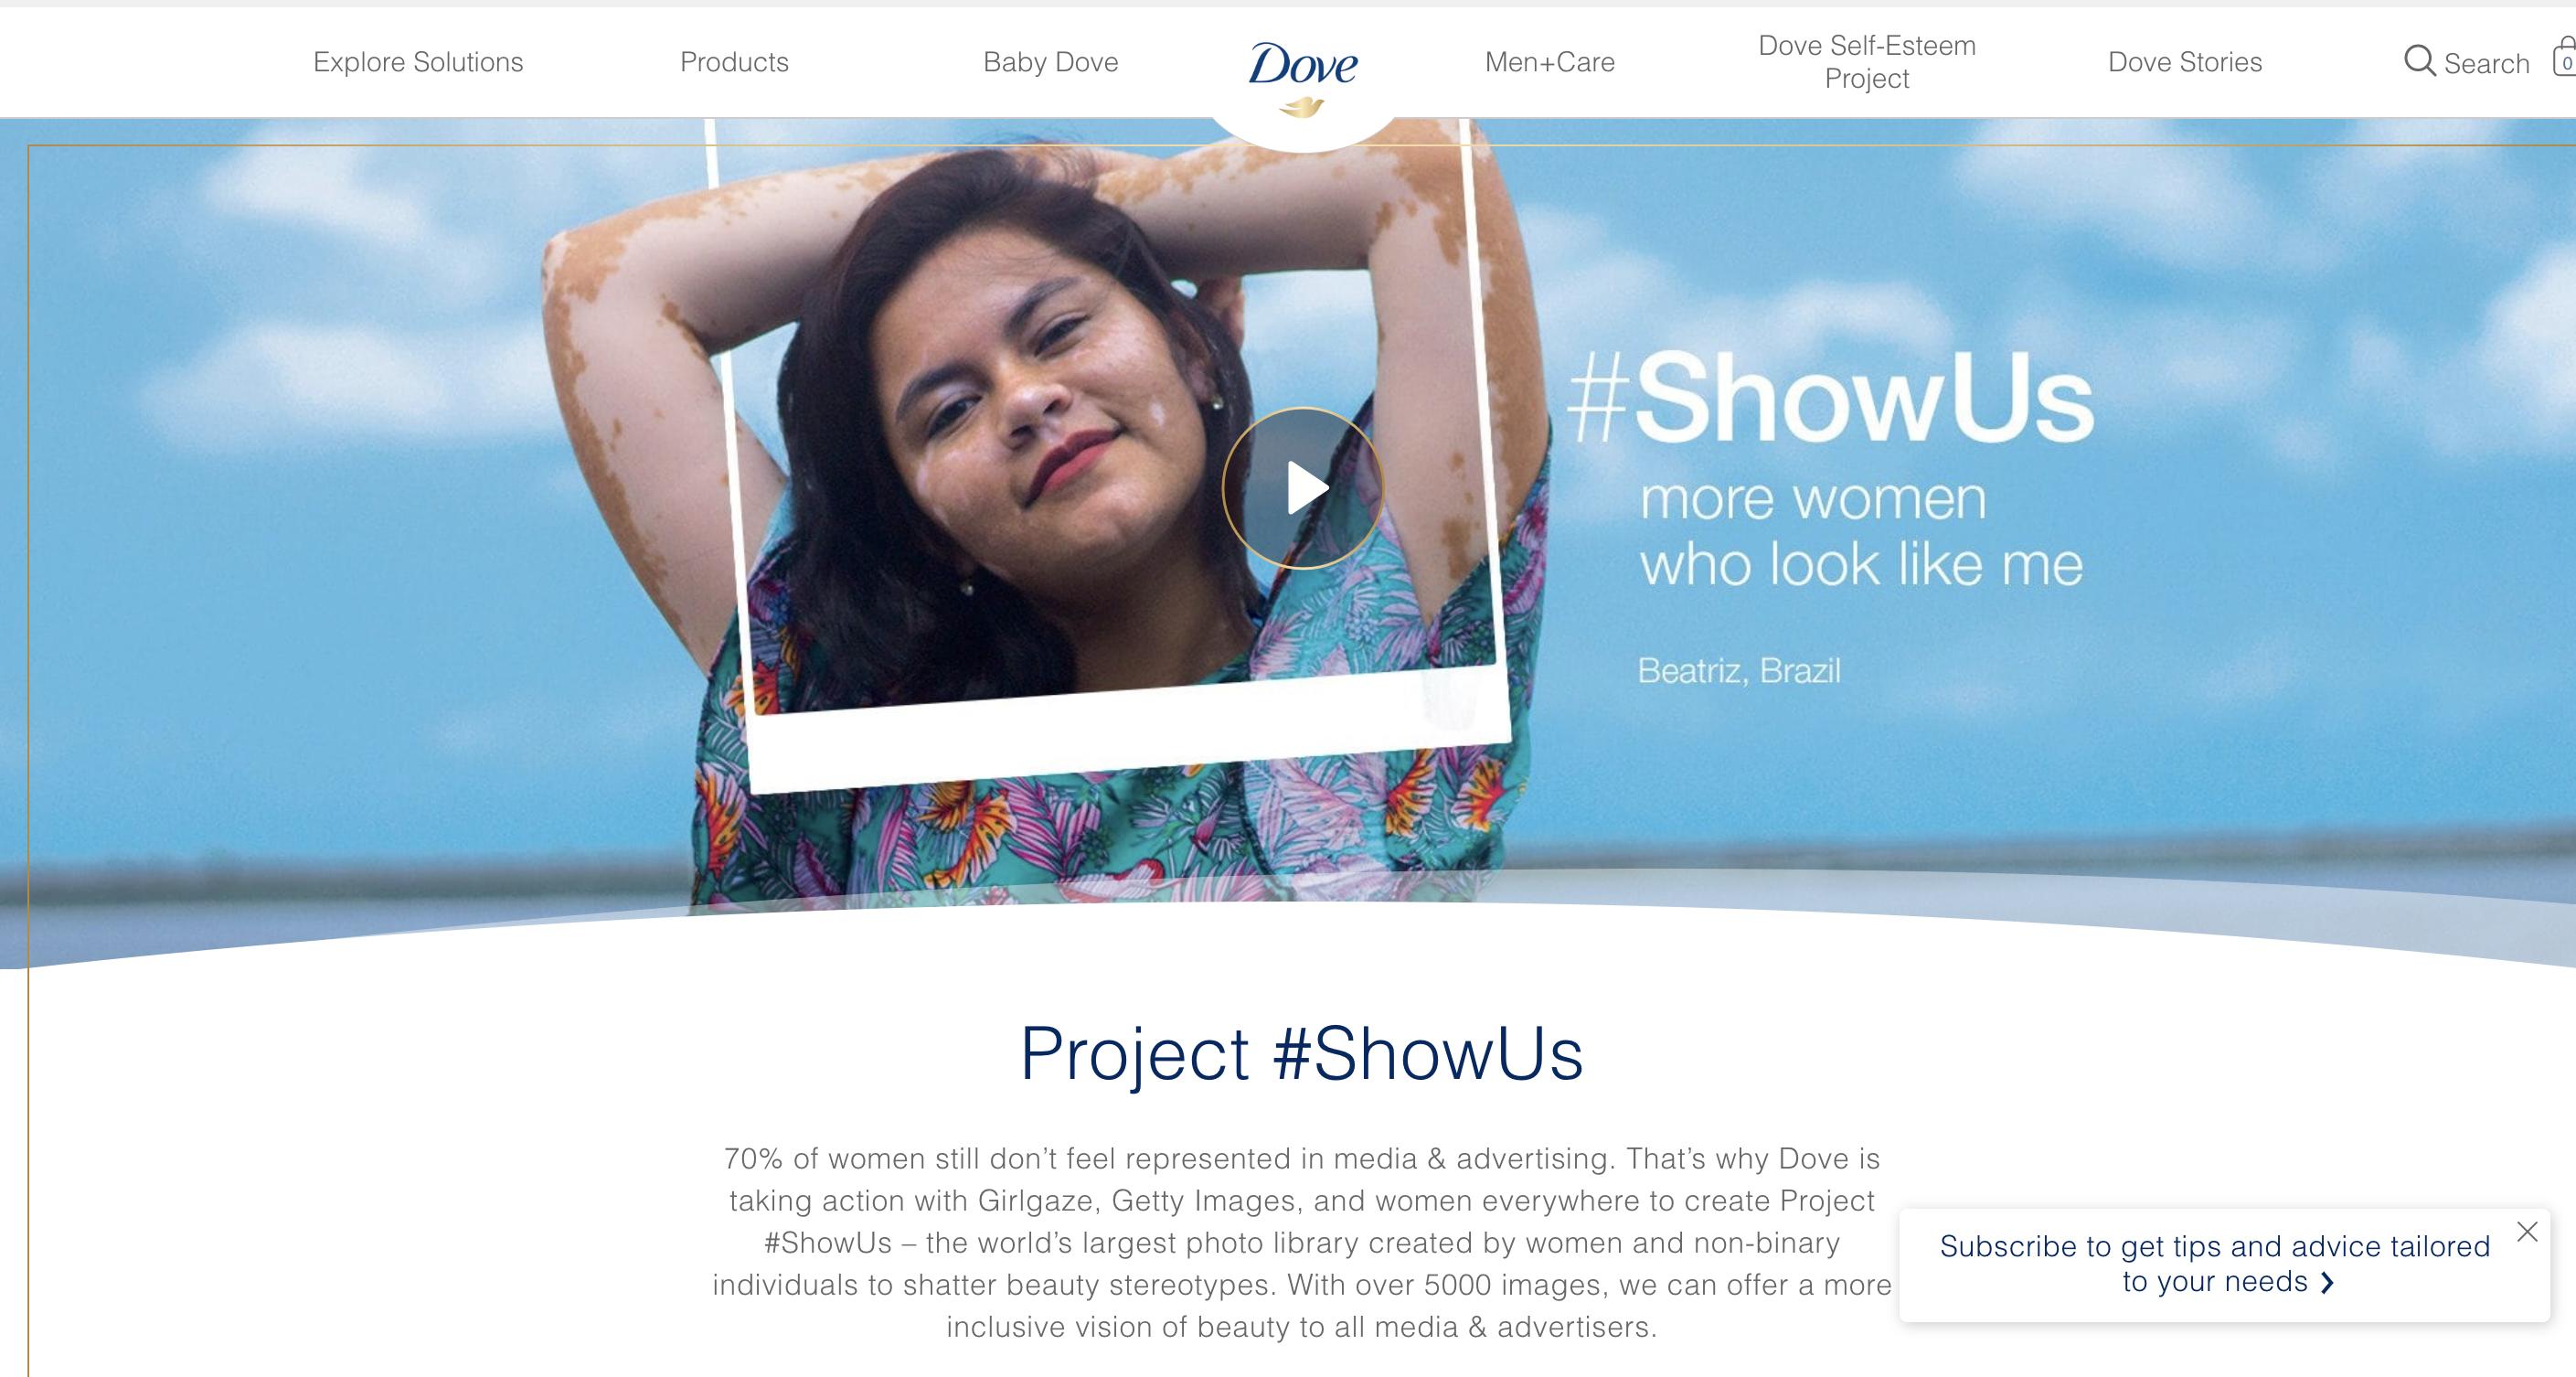 Dove Brand Messaging